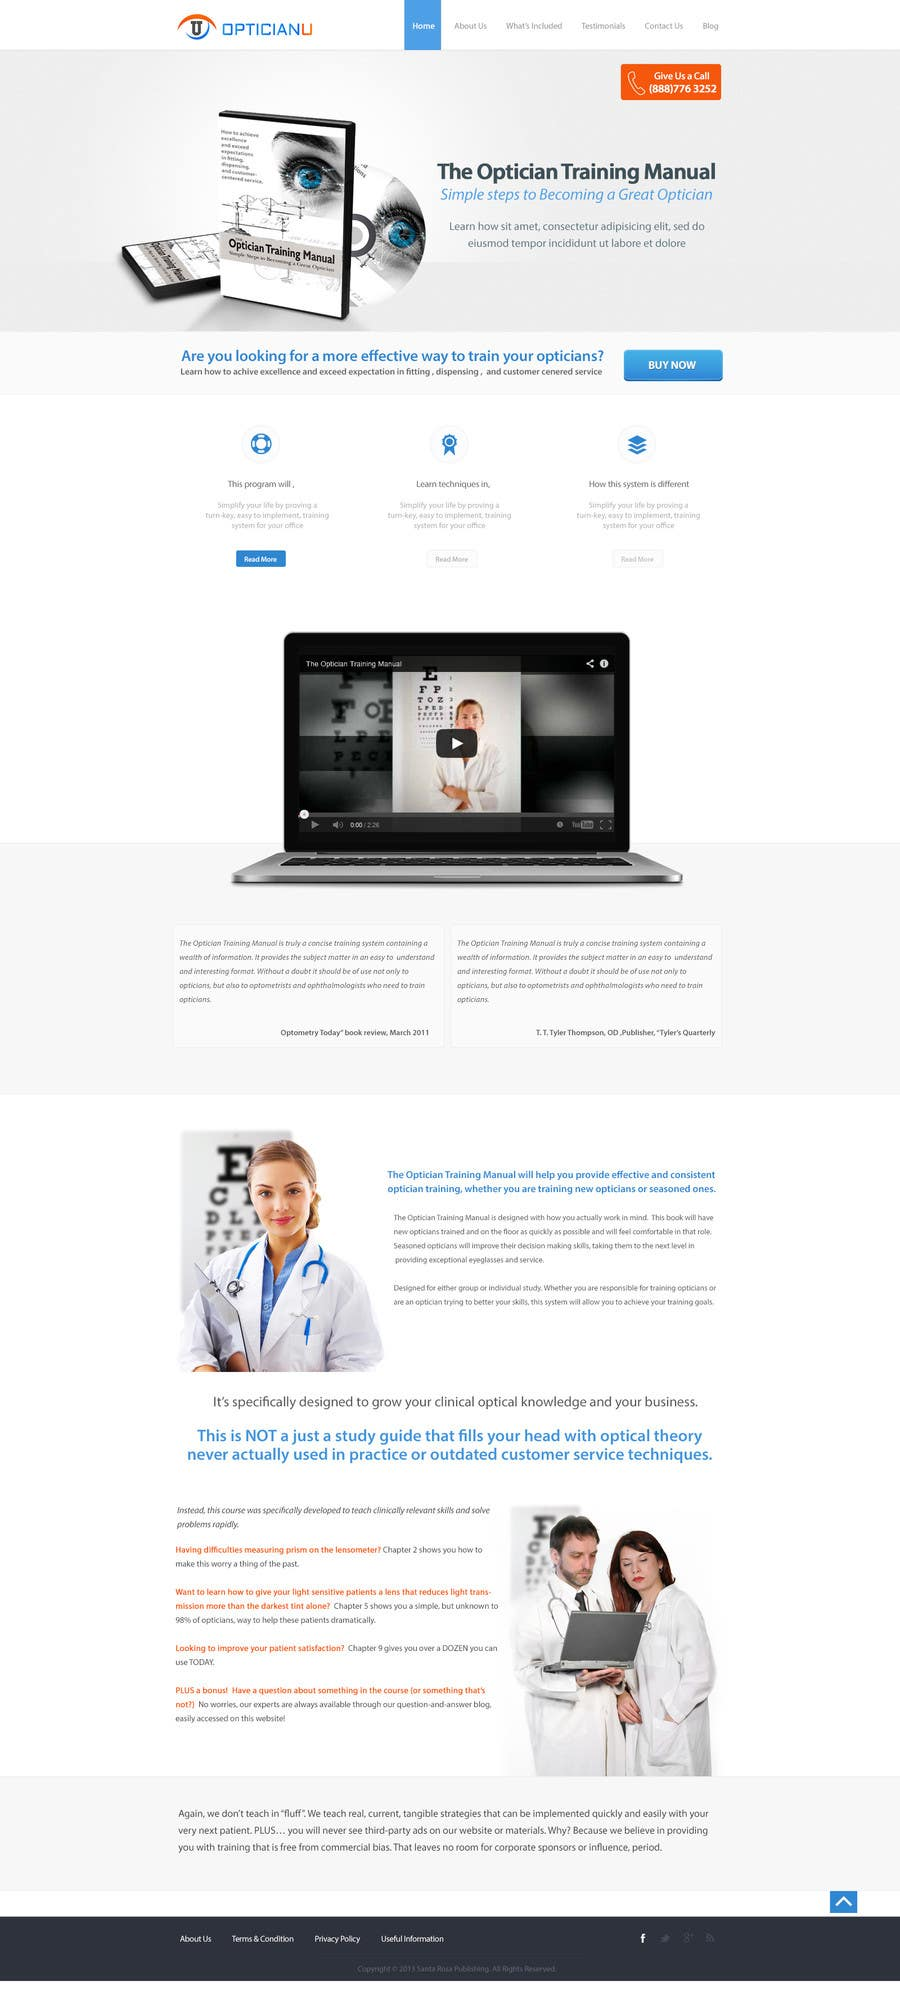 Penyertaan Peraduan #                                        4                                      untuk                                         Design a Website Mockup for www.OpticianTraining.com